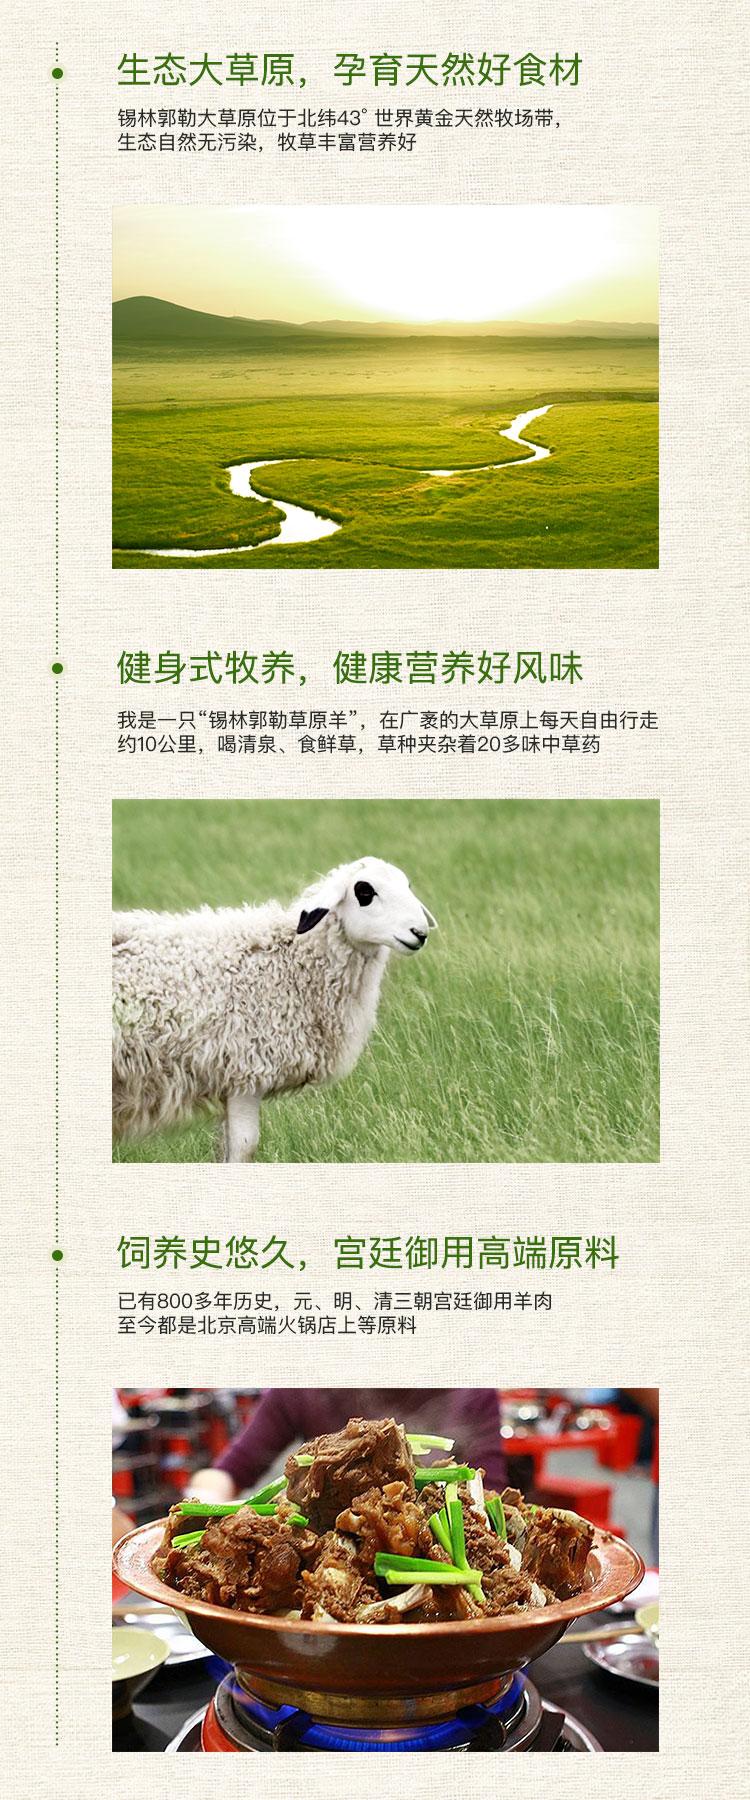 0902羊蝎子yyyyy_03